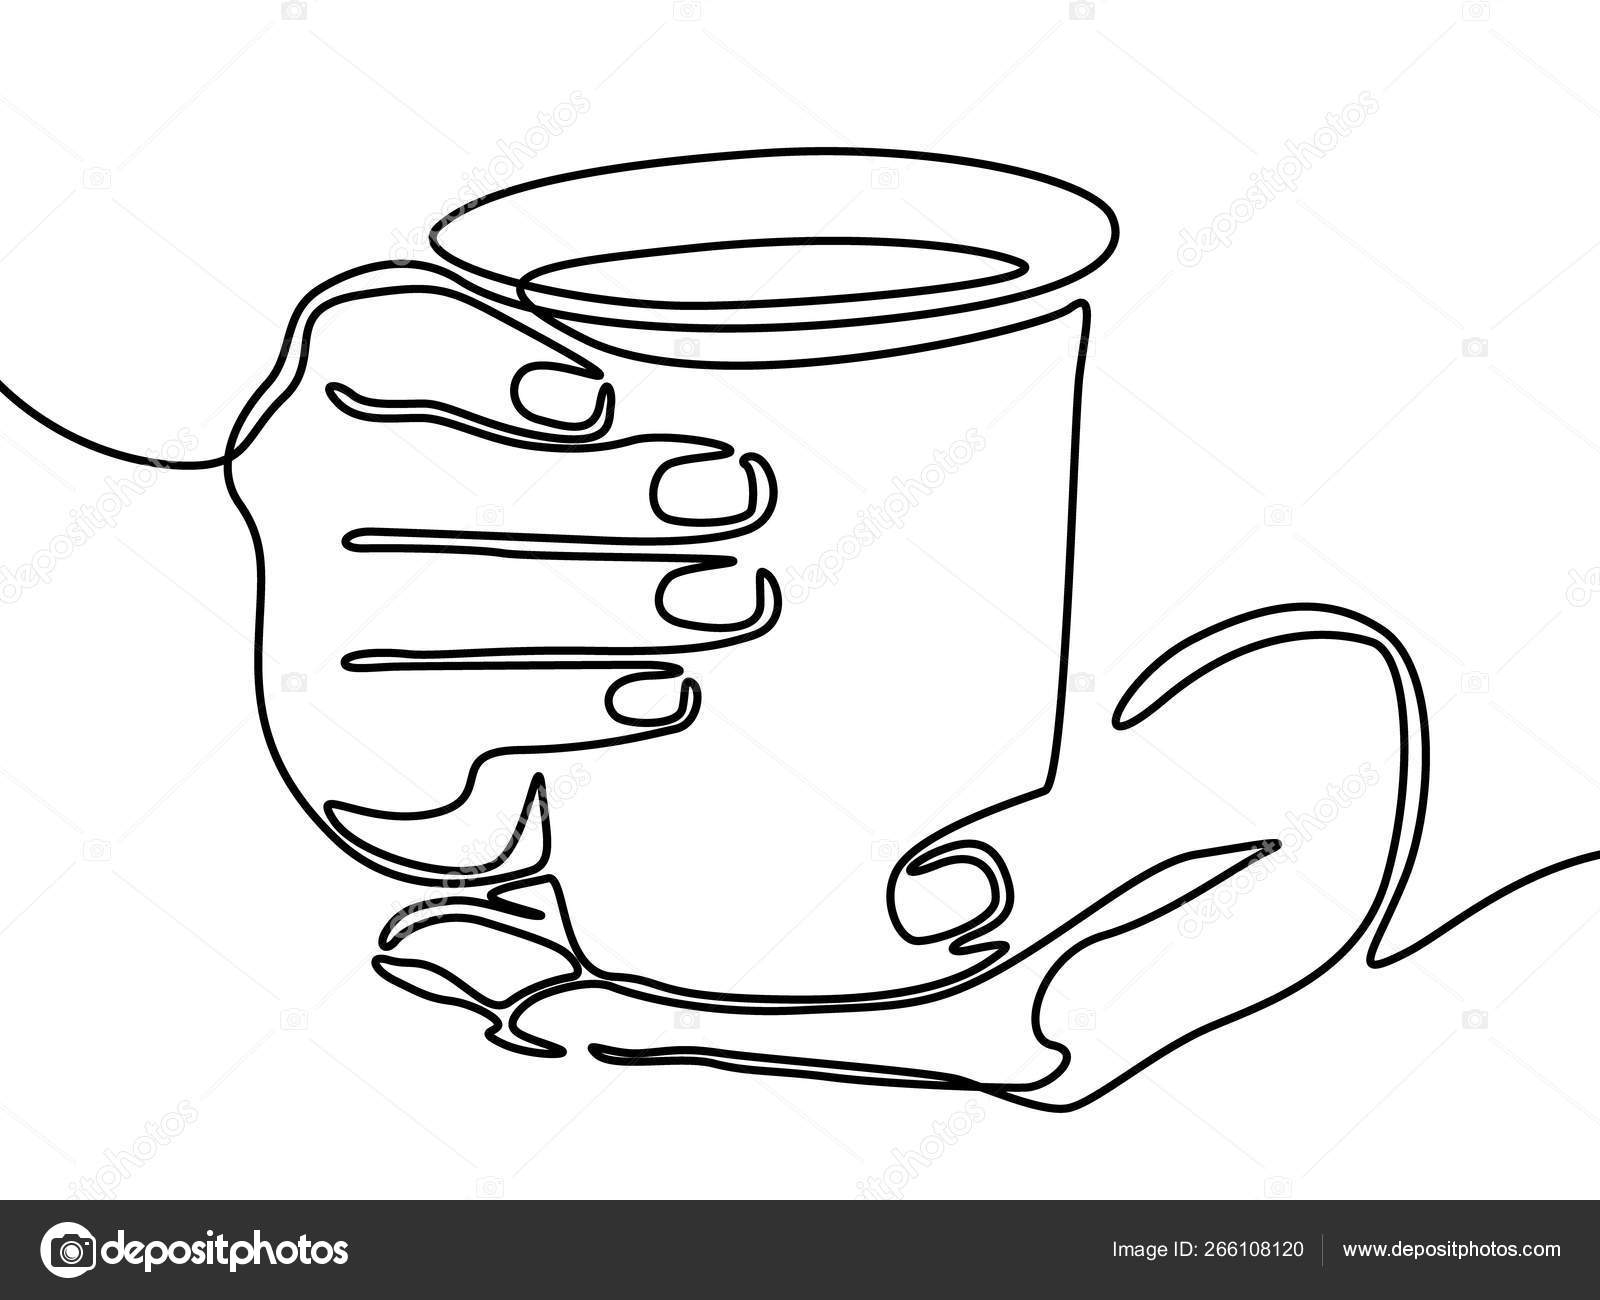 Hand Holding Mug Tea Coffee One Line Drawing Vector Image By C Askhatgilyakhov Vector Stock 266108120